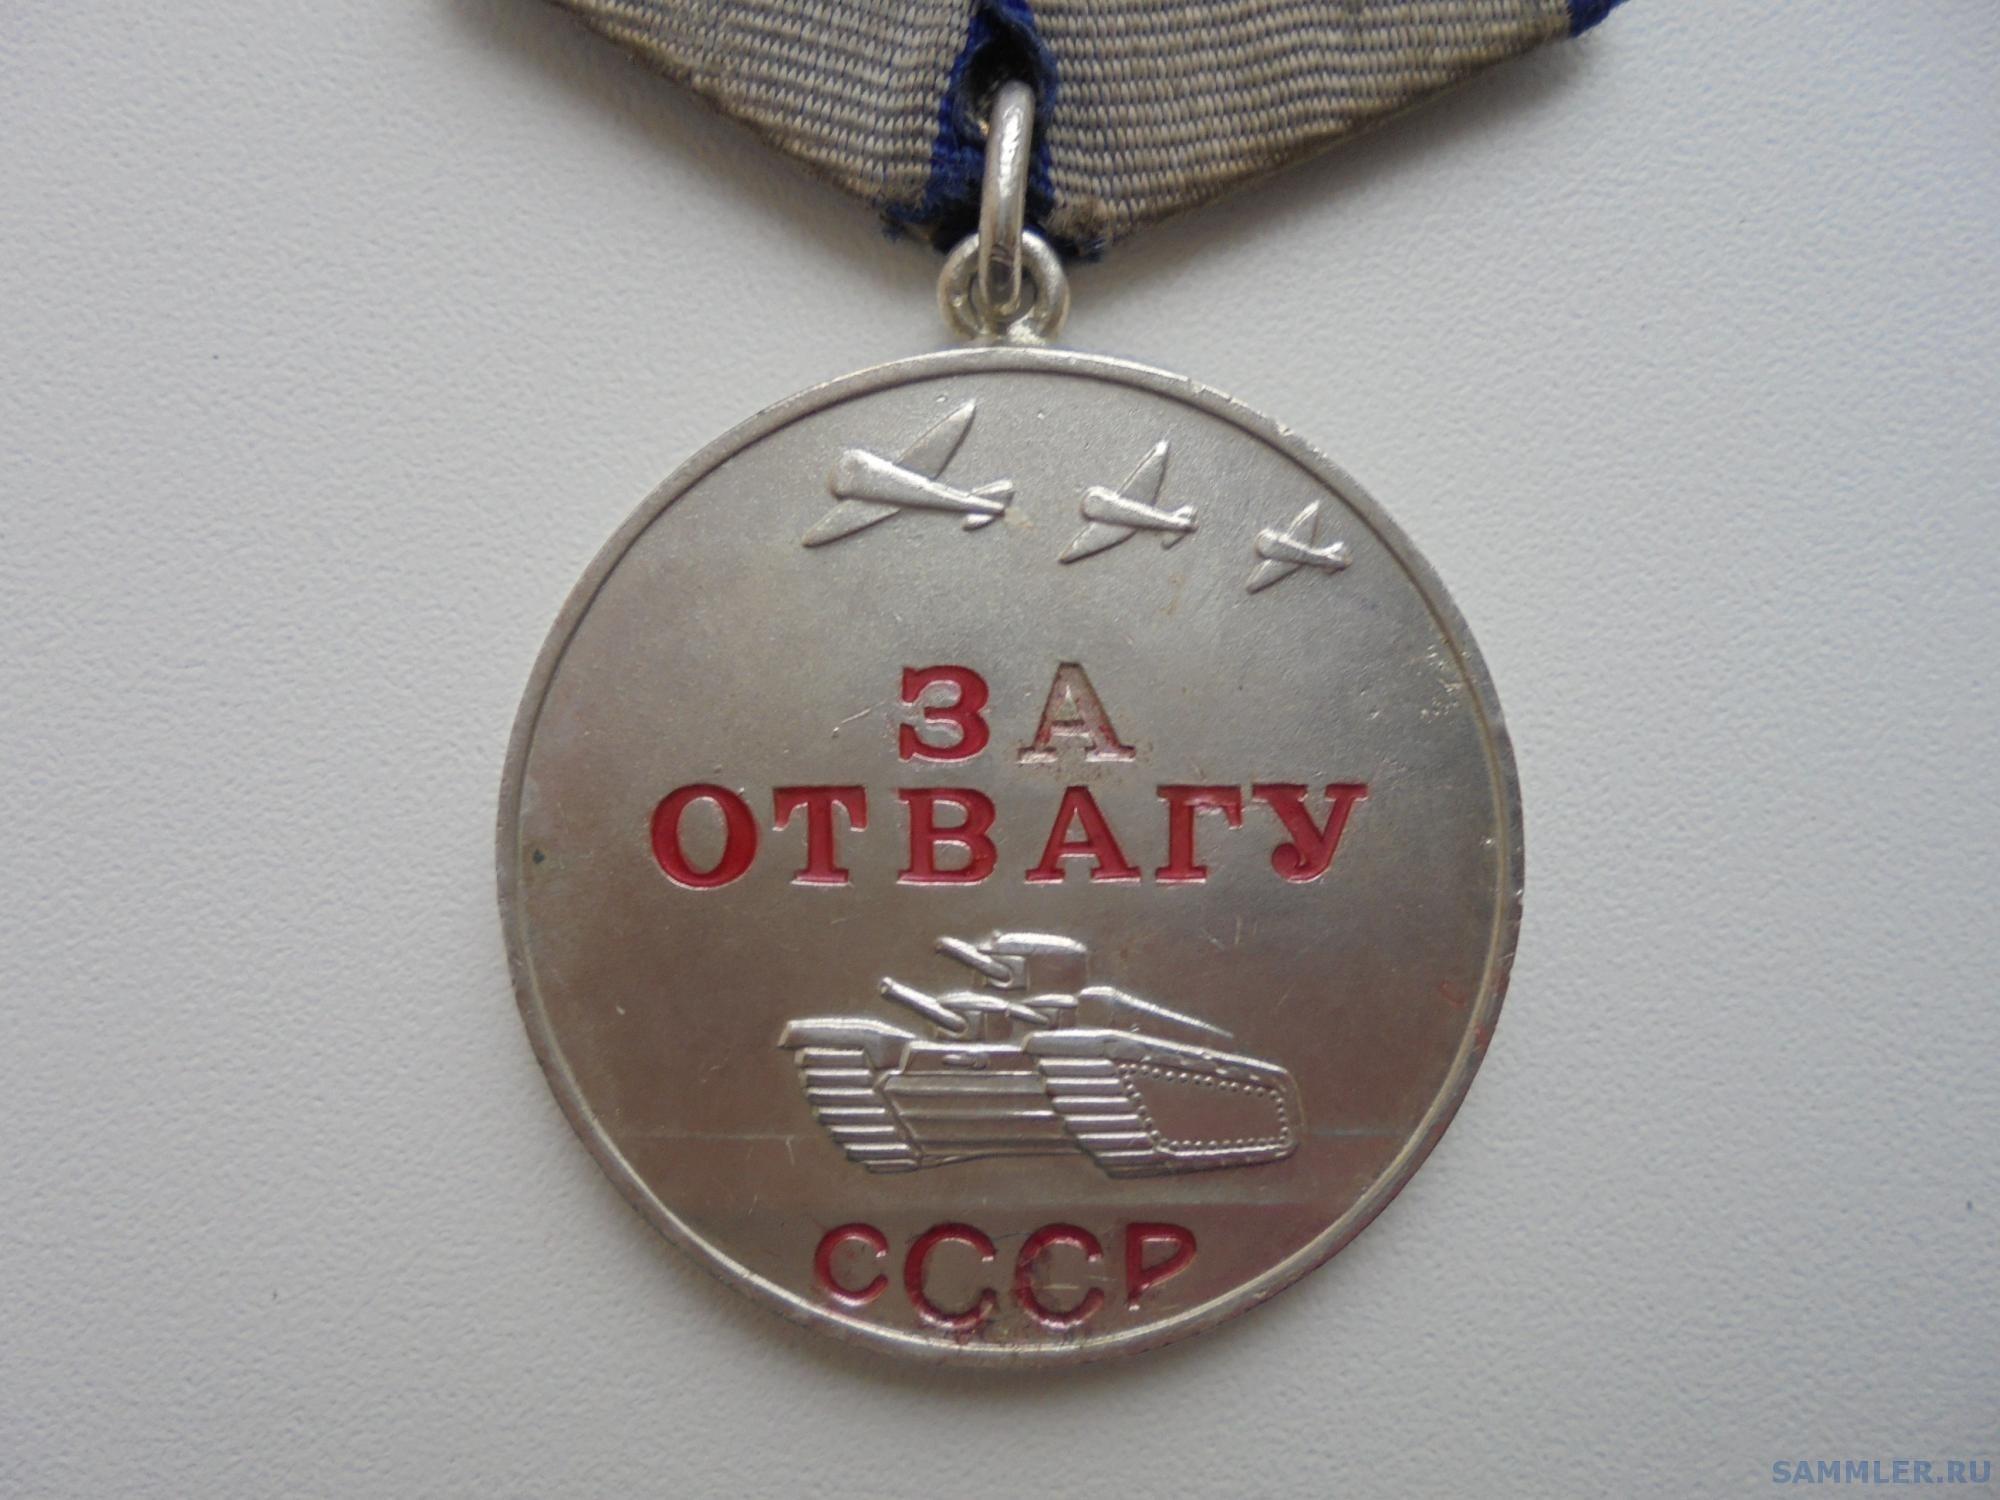 DSC00299.JPG